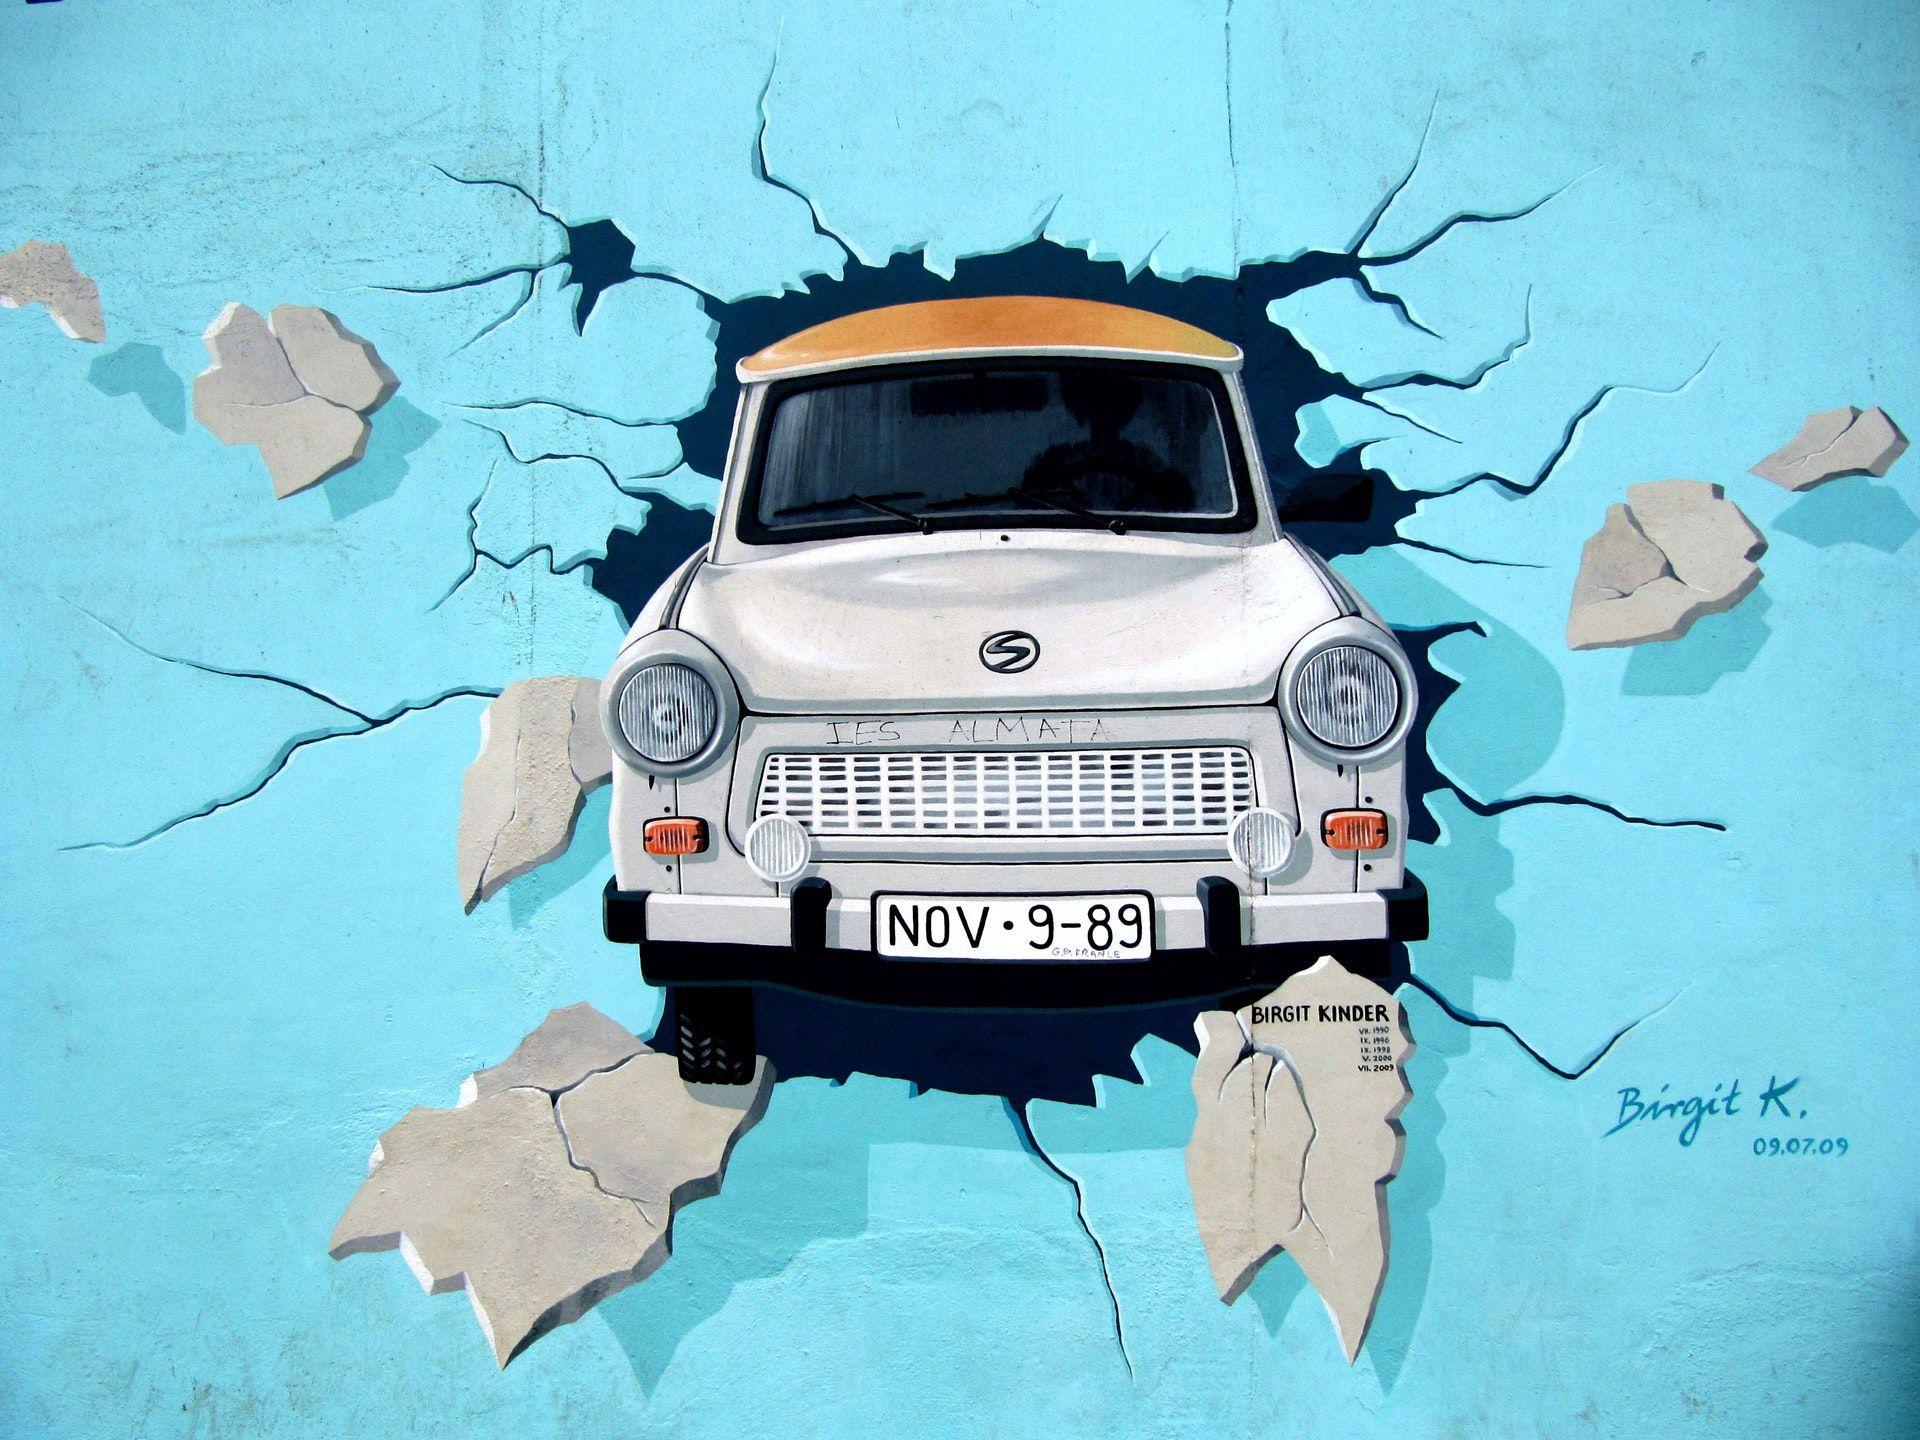 عکس زمینه نقاشی ماشین در دیوار آبی پس زمینه